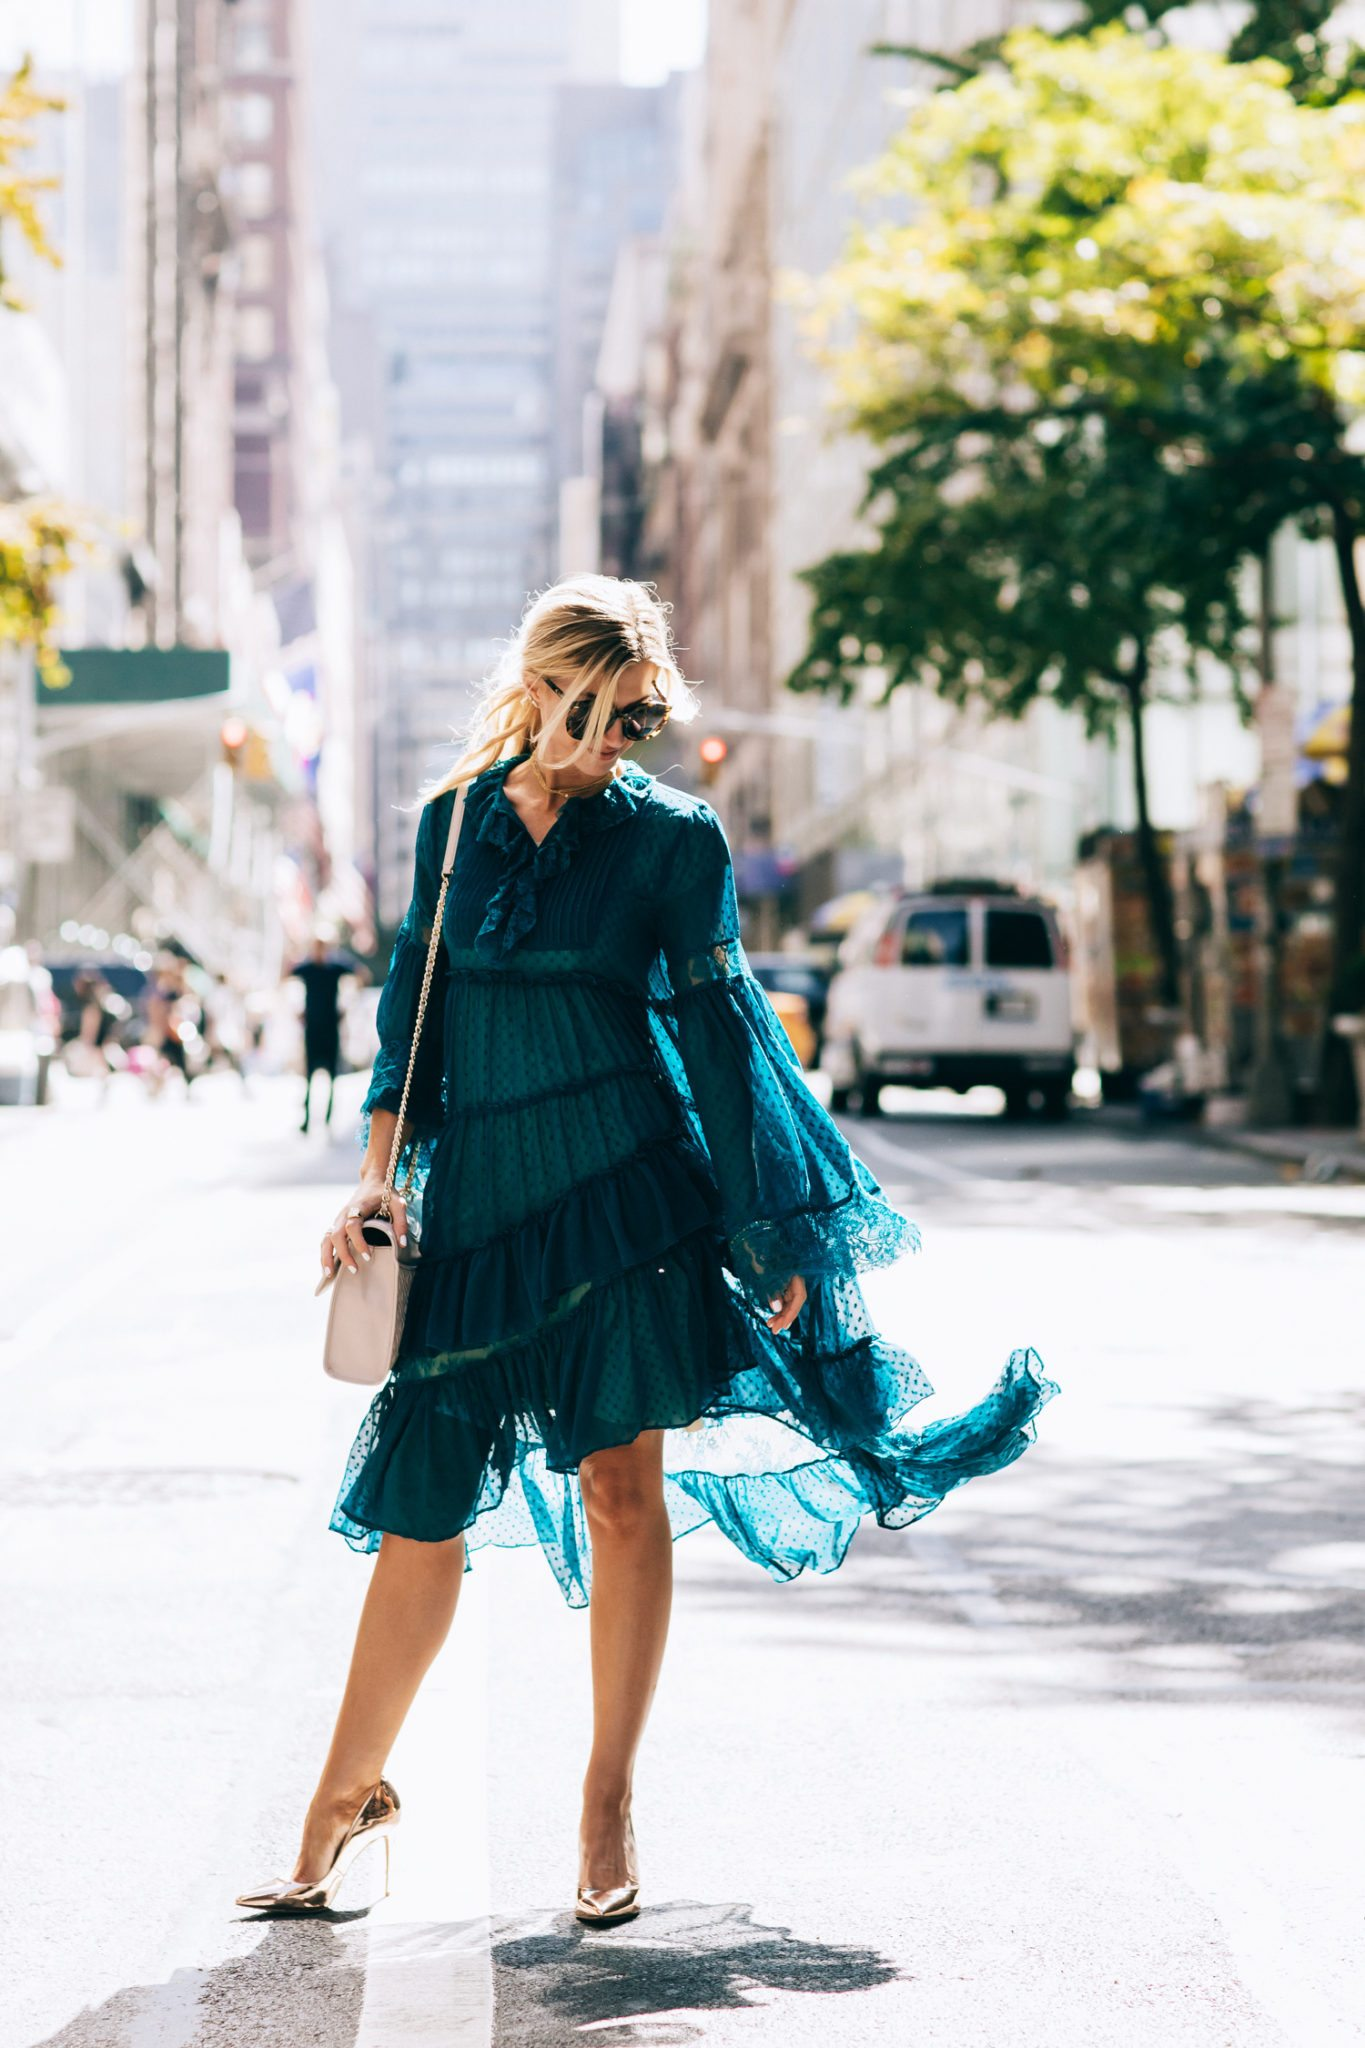 Ruffle lace turquoise dress.